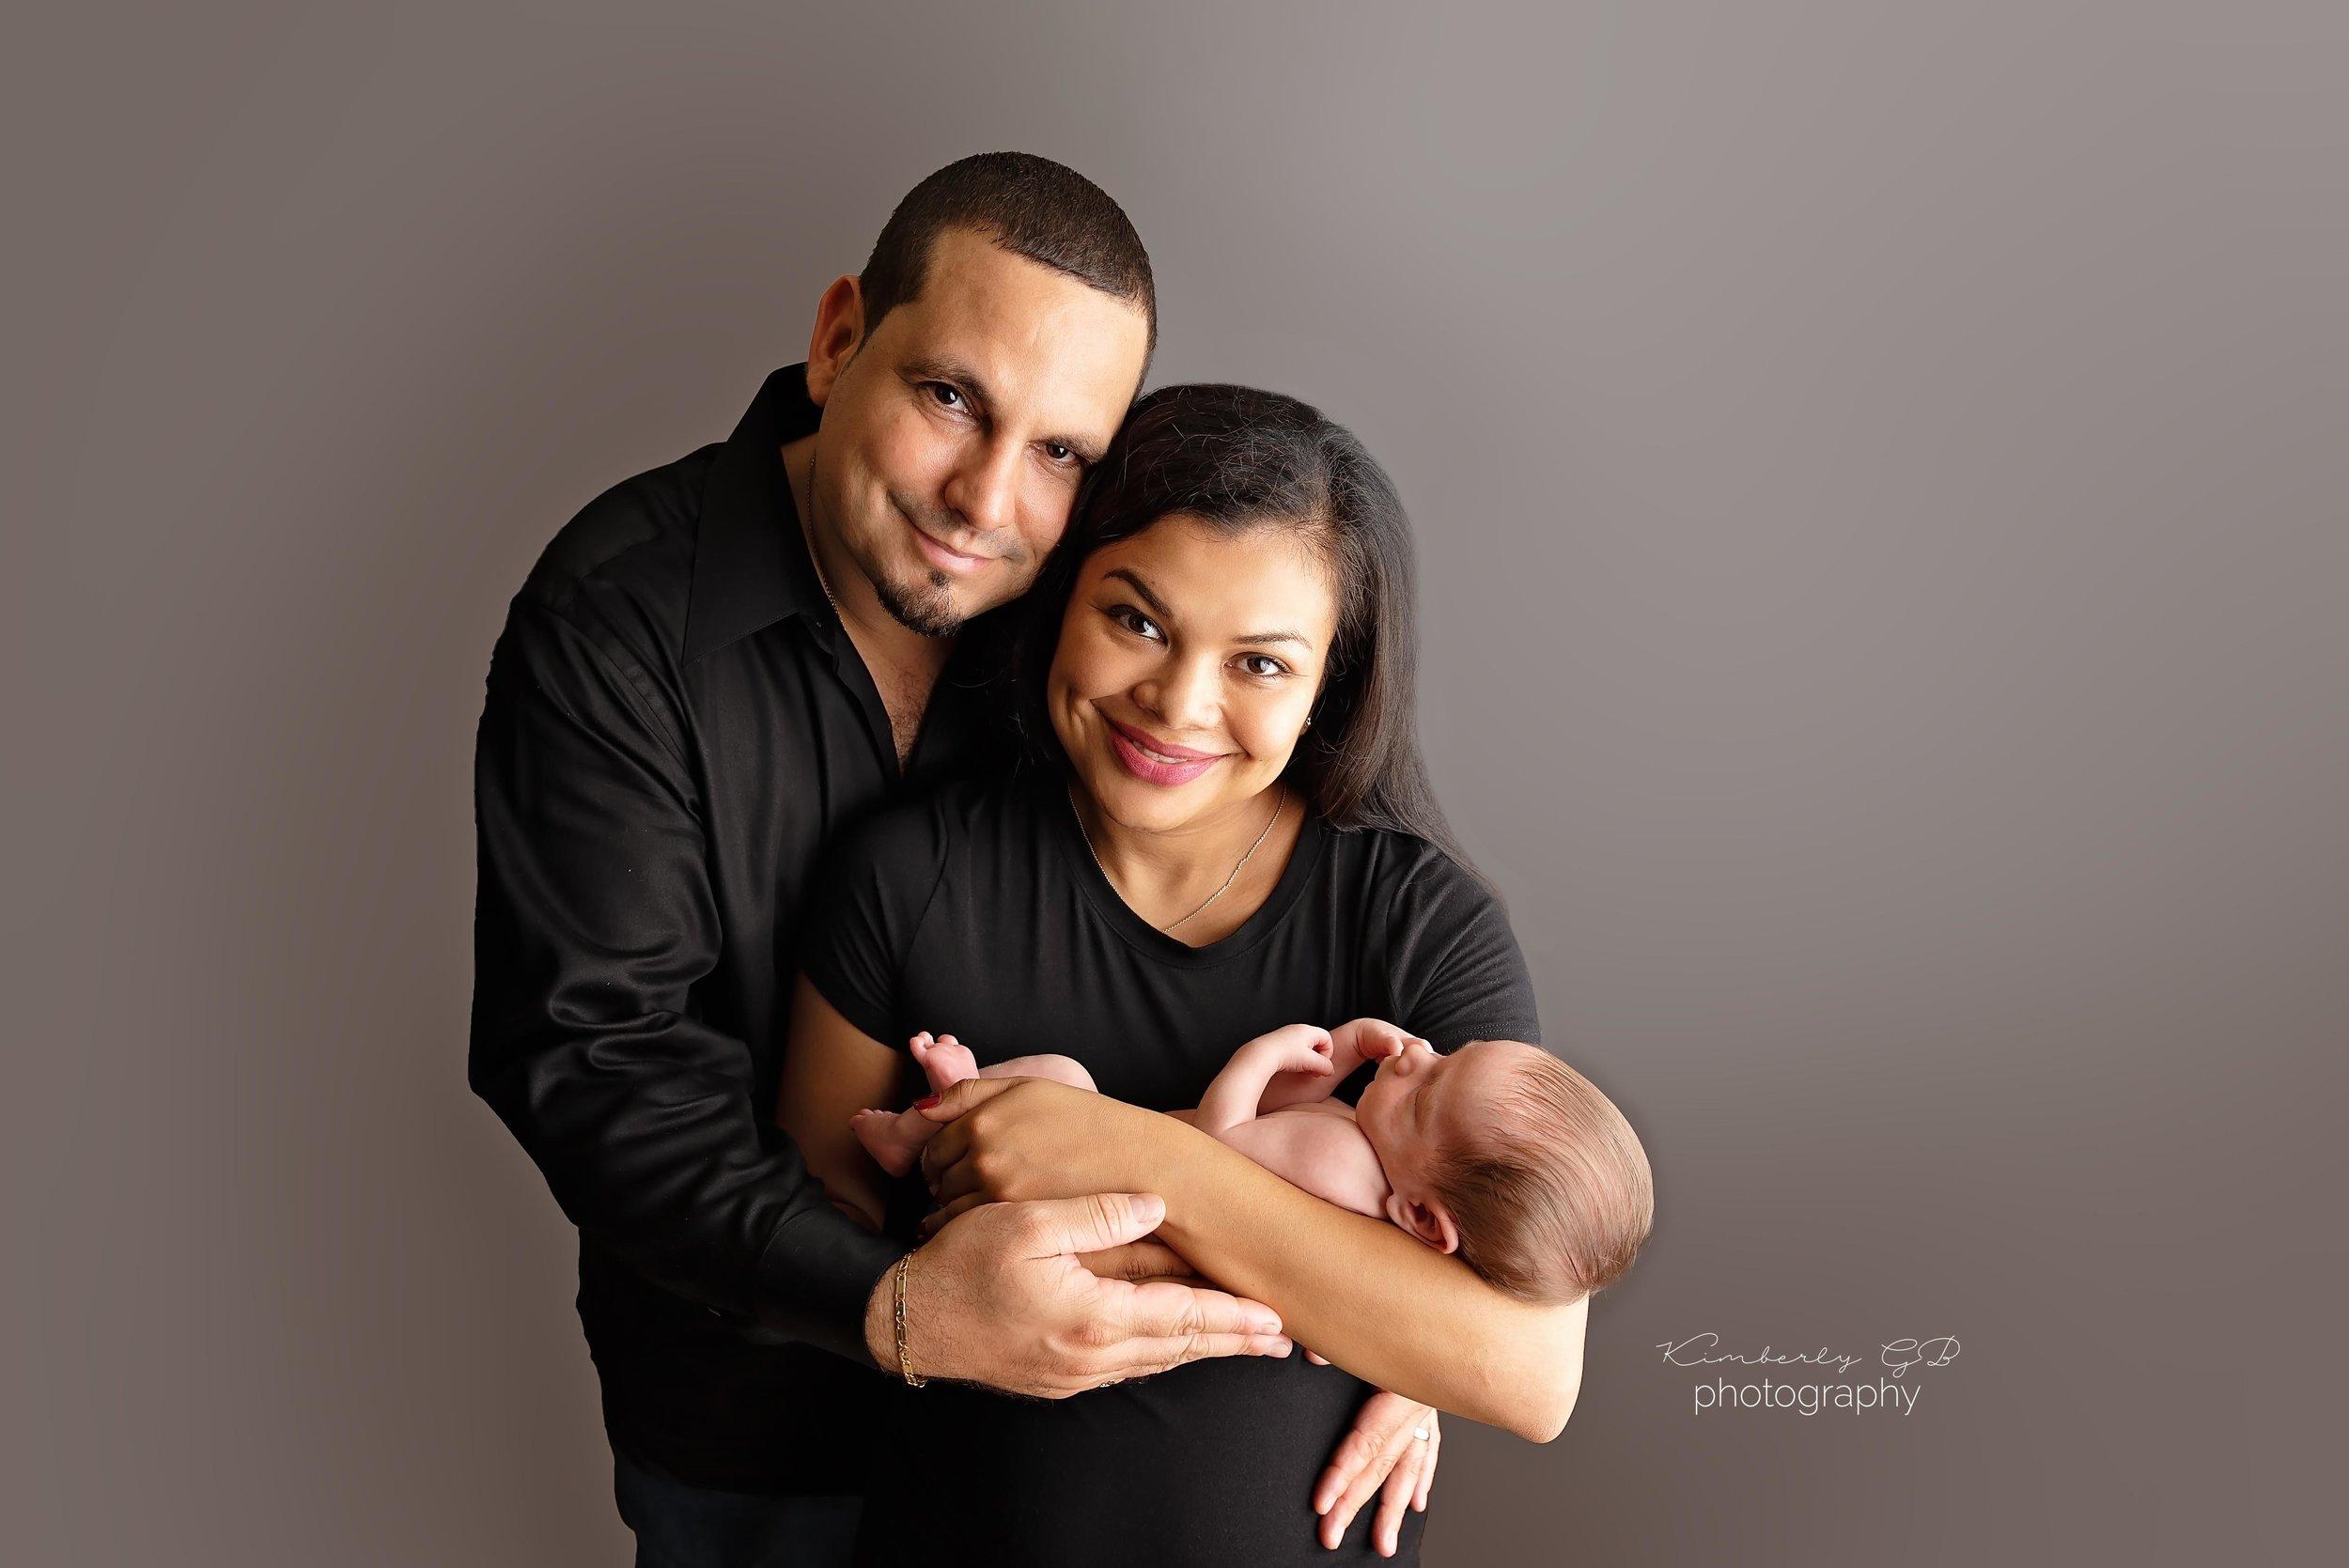 fotografia-de-recien-nacidos-bebes-newborn-en-puerto-rico-kimberly-gb-photography-fotografa-253.jpg